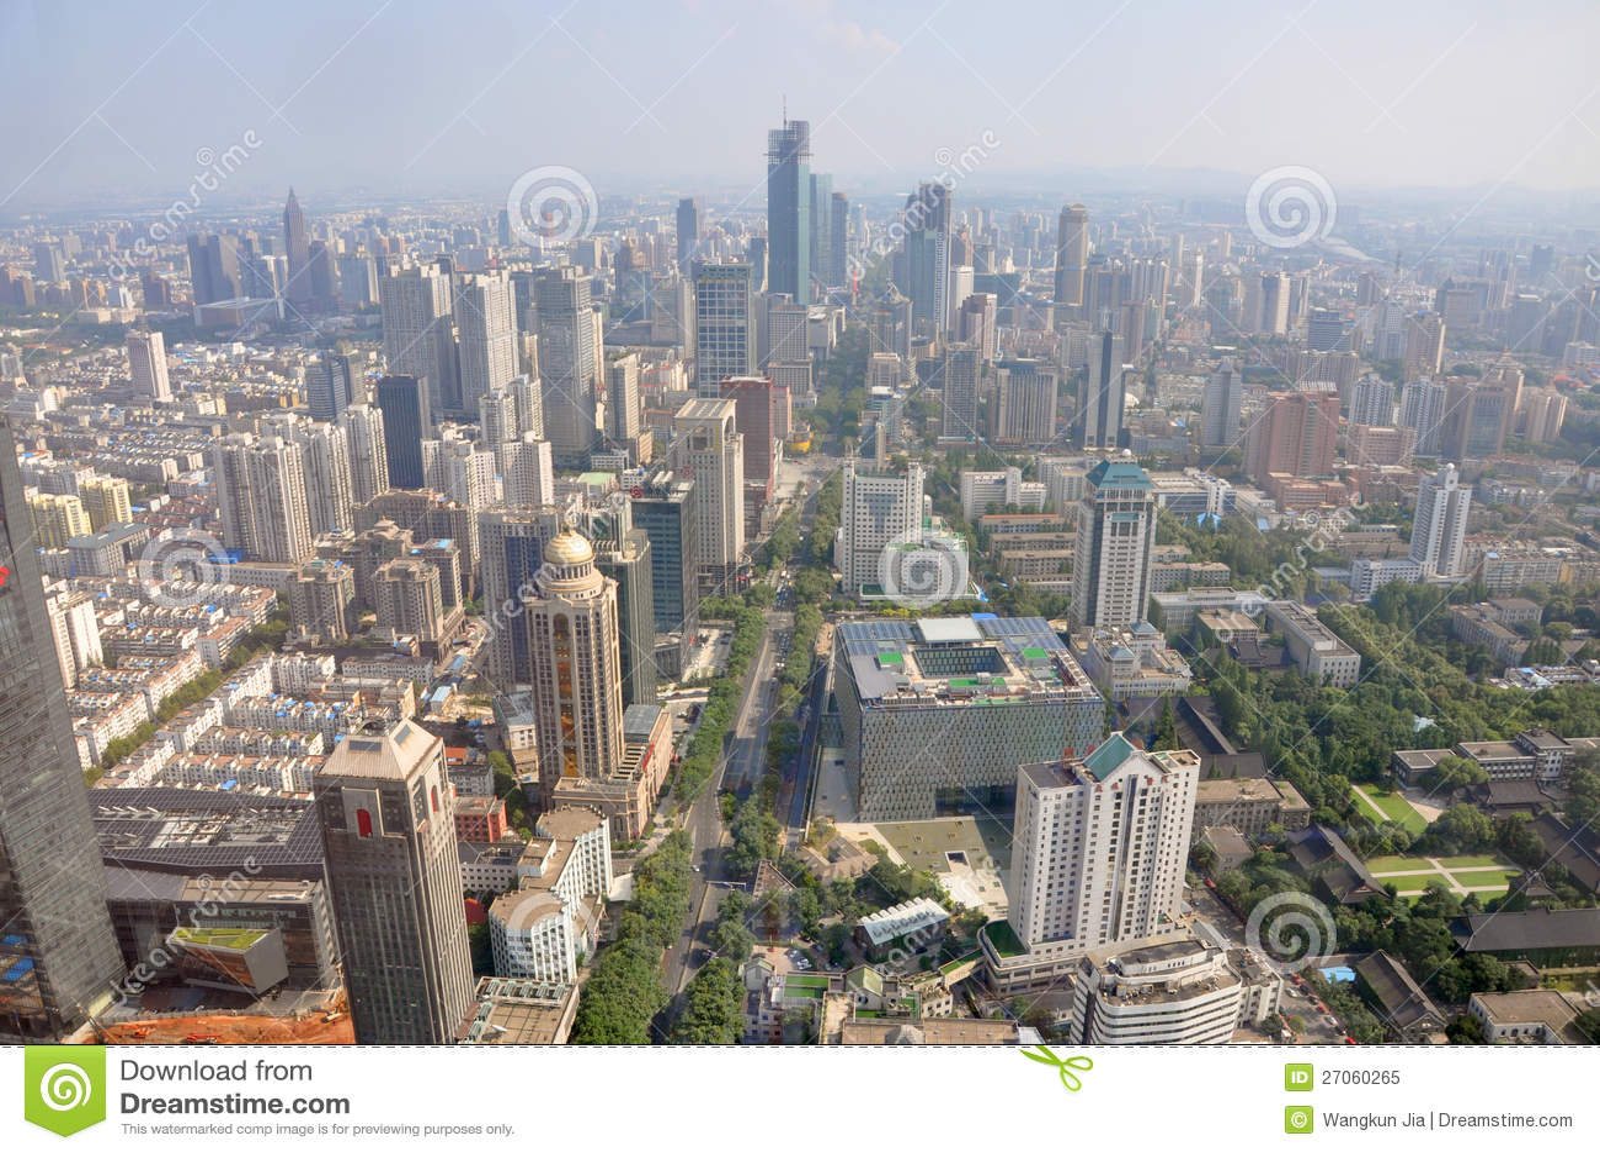 Aerial view of Nanjing Modern City Skyline Xinjiekou (South), viewed ...